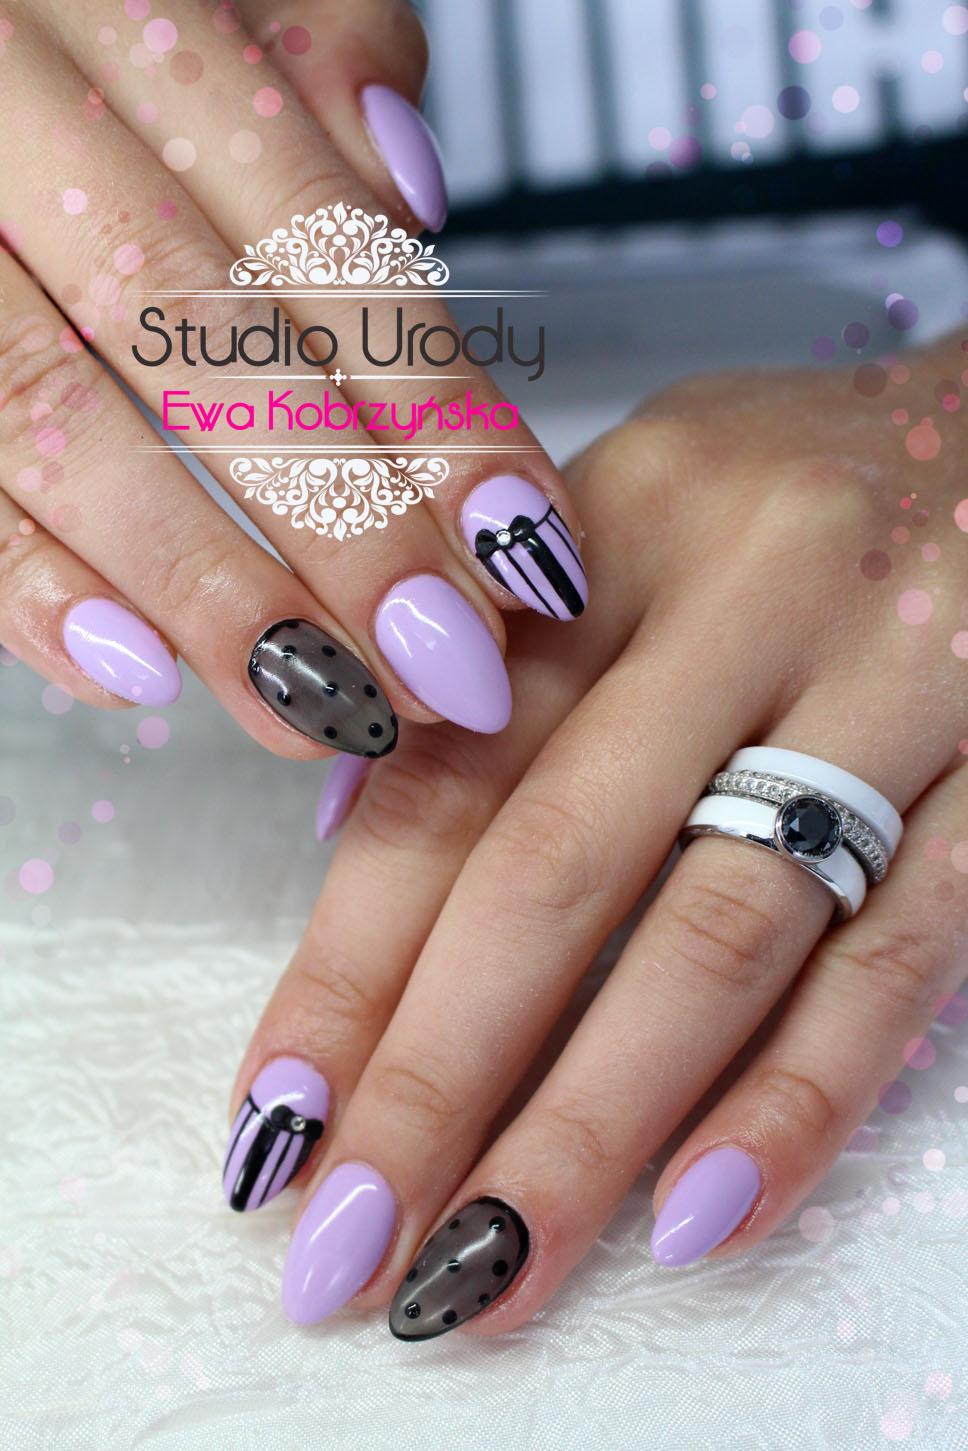 Galeria - Fiolet Studio - stylizacja paznokci, manicure